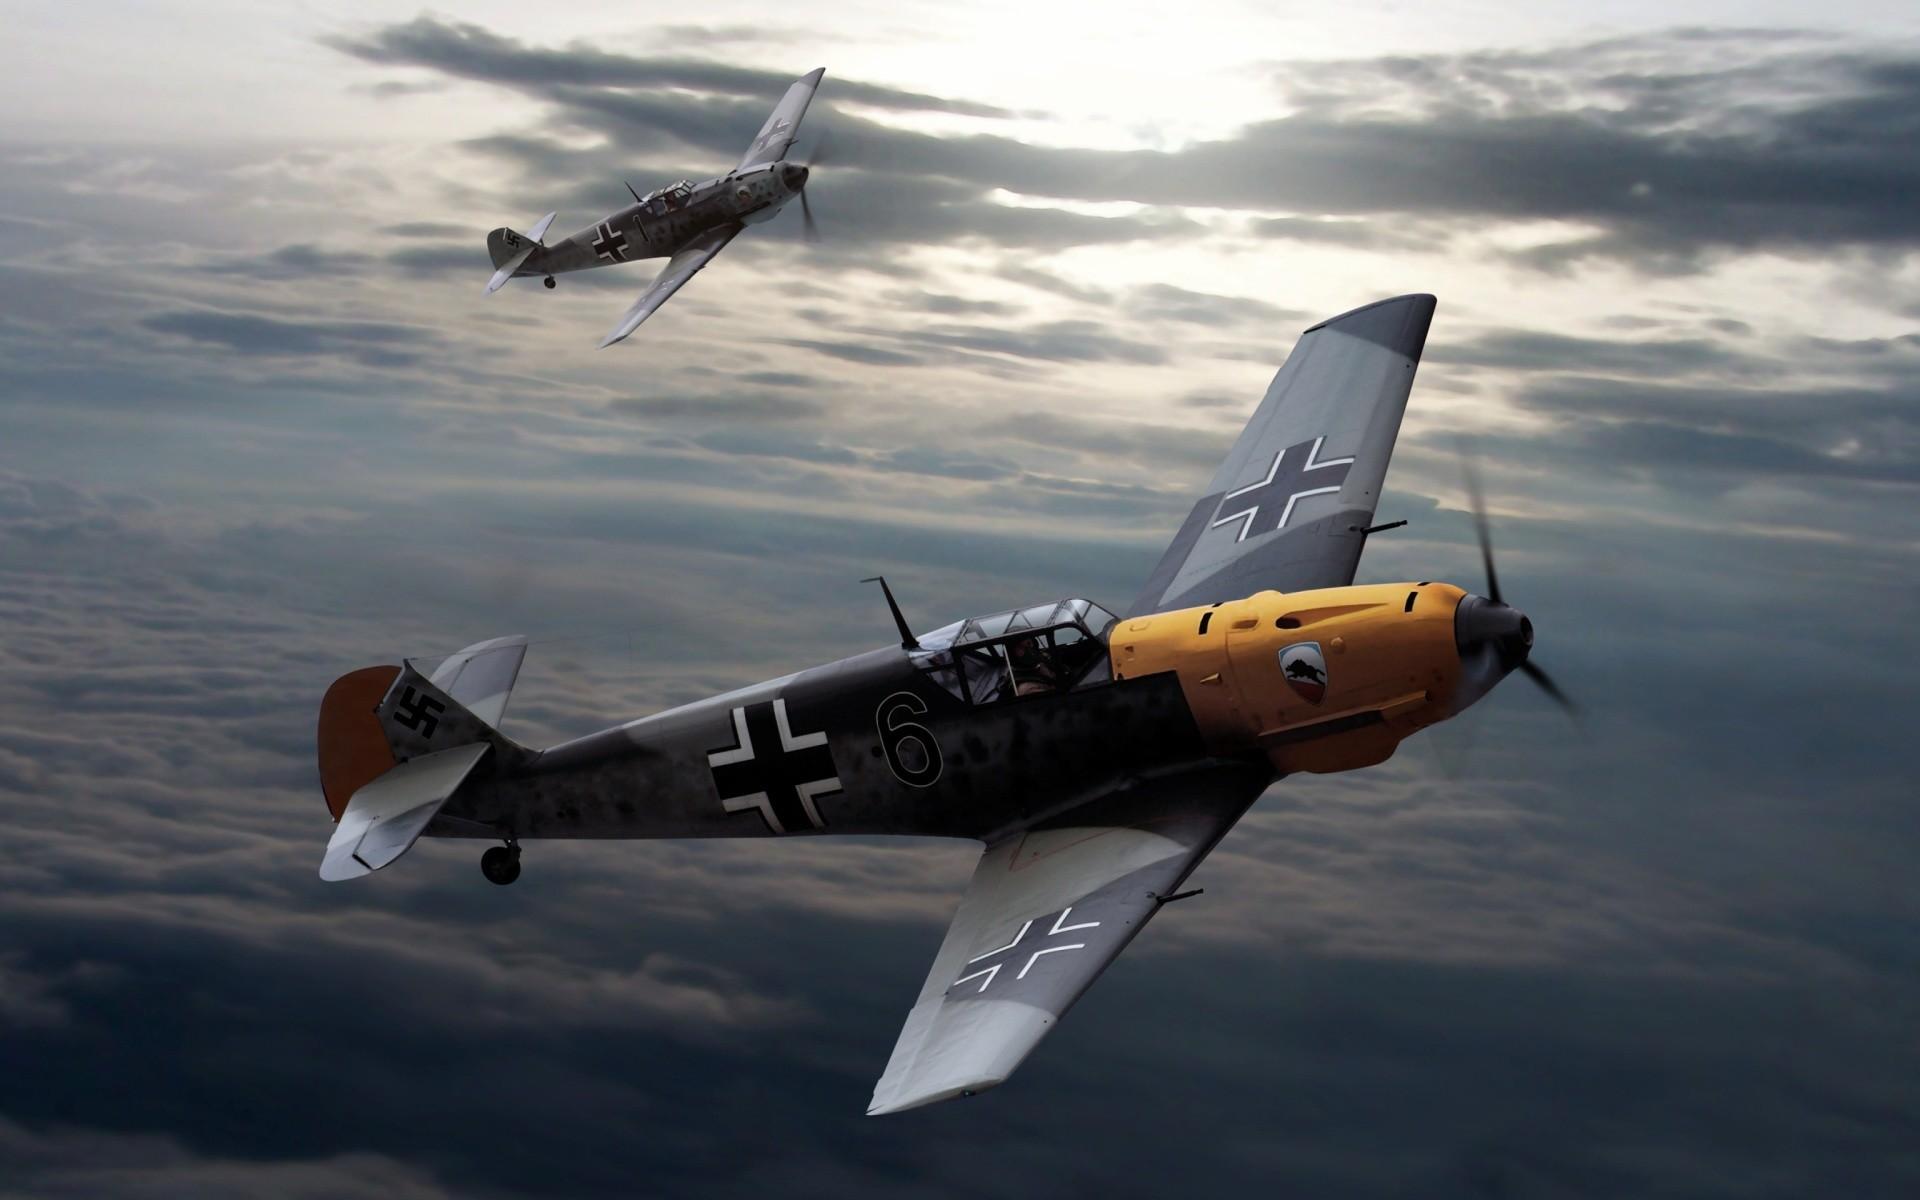 WWII Fighter Planes Wallpapers 1920×1080 – WallpaperSafari